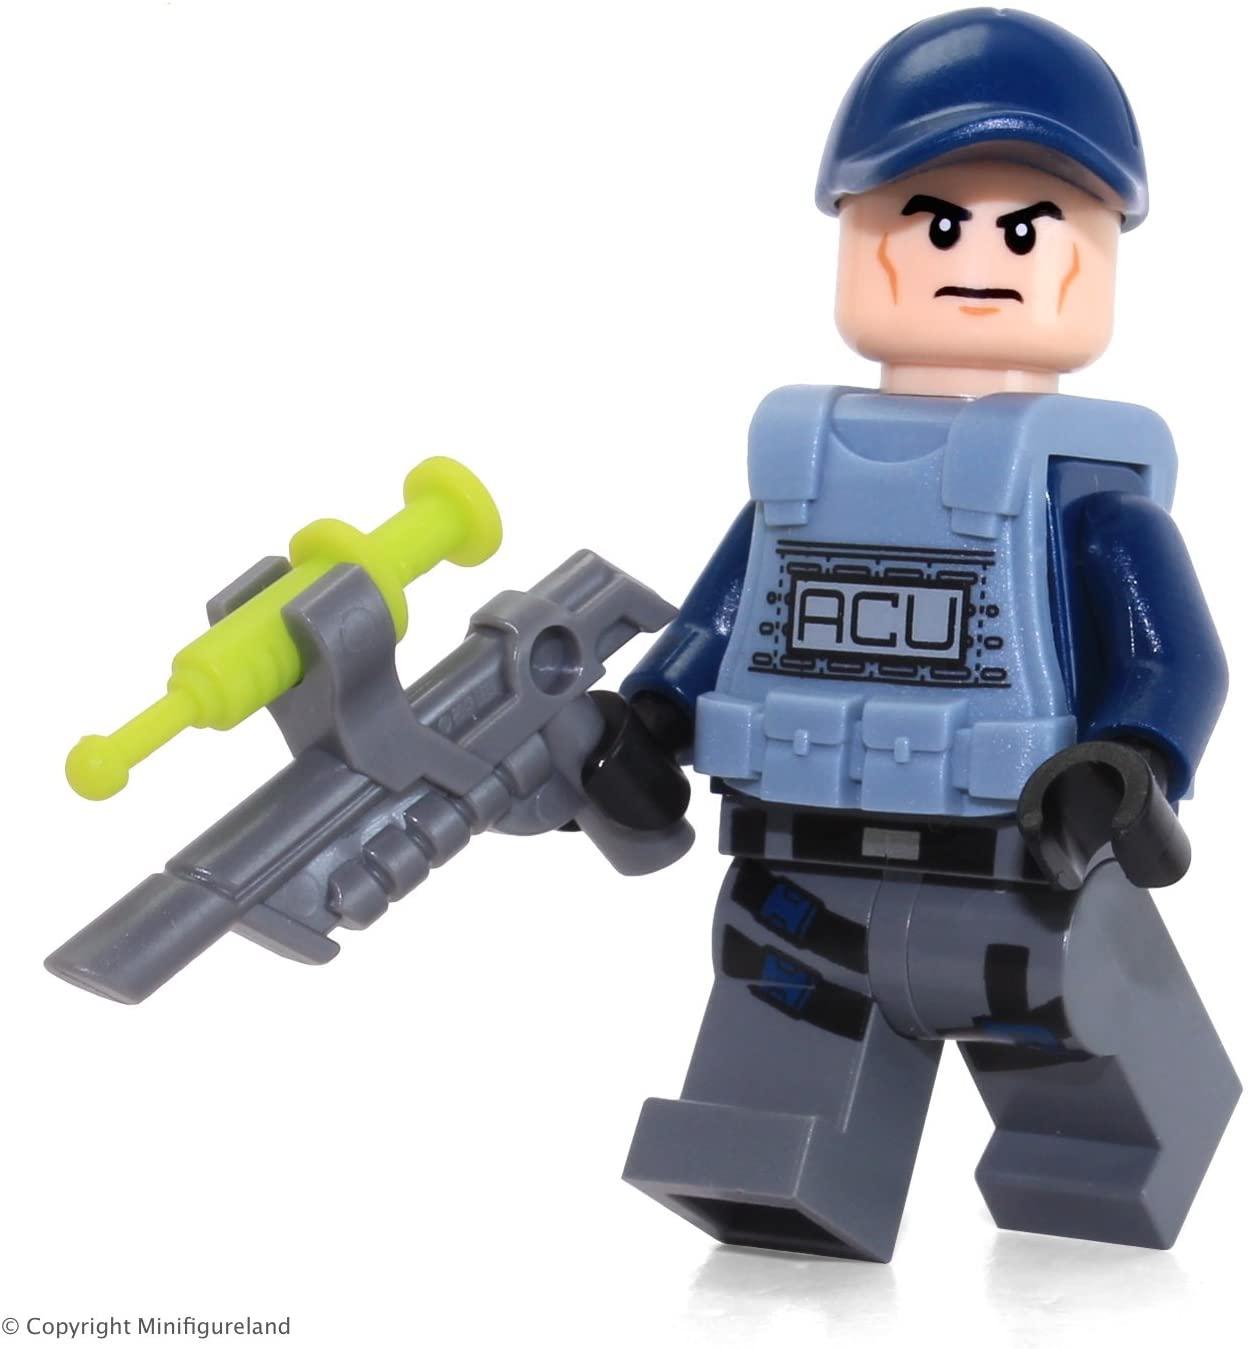 LEGO Jurassic World ACU Minifigure